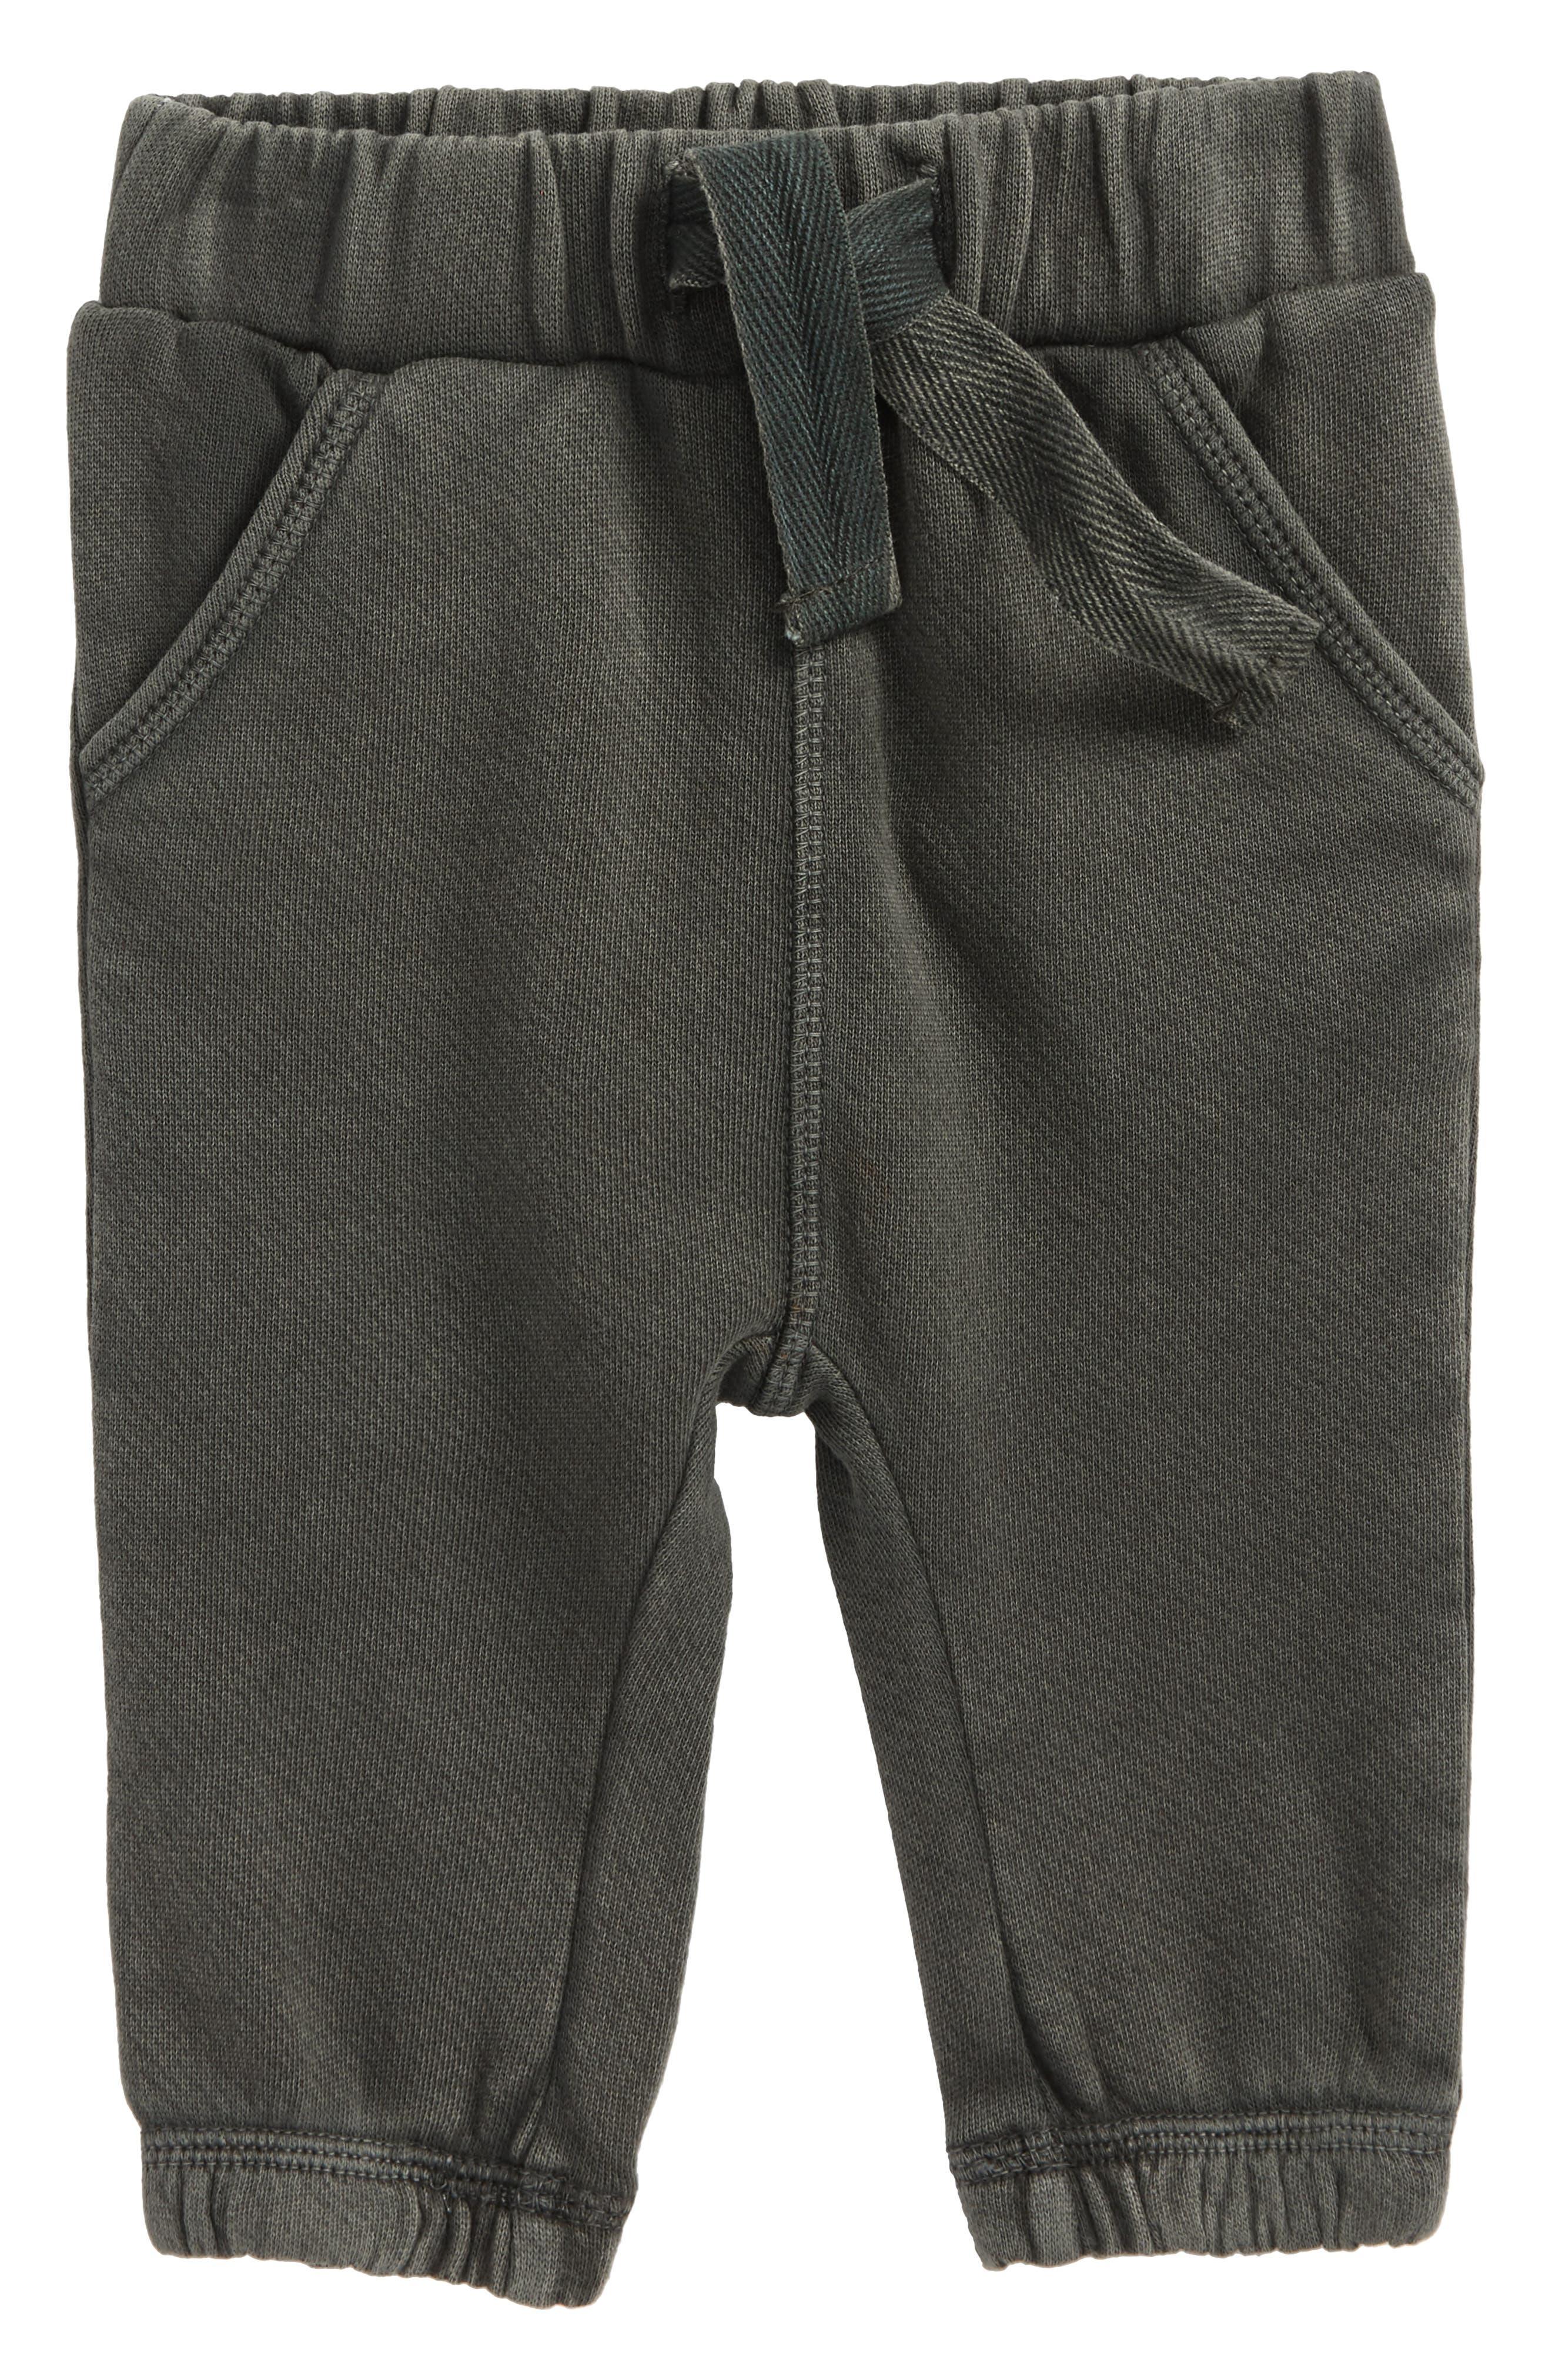 Tucker & Tate Washed Jogger Pants,                         Main,                         color,